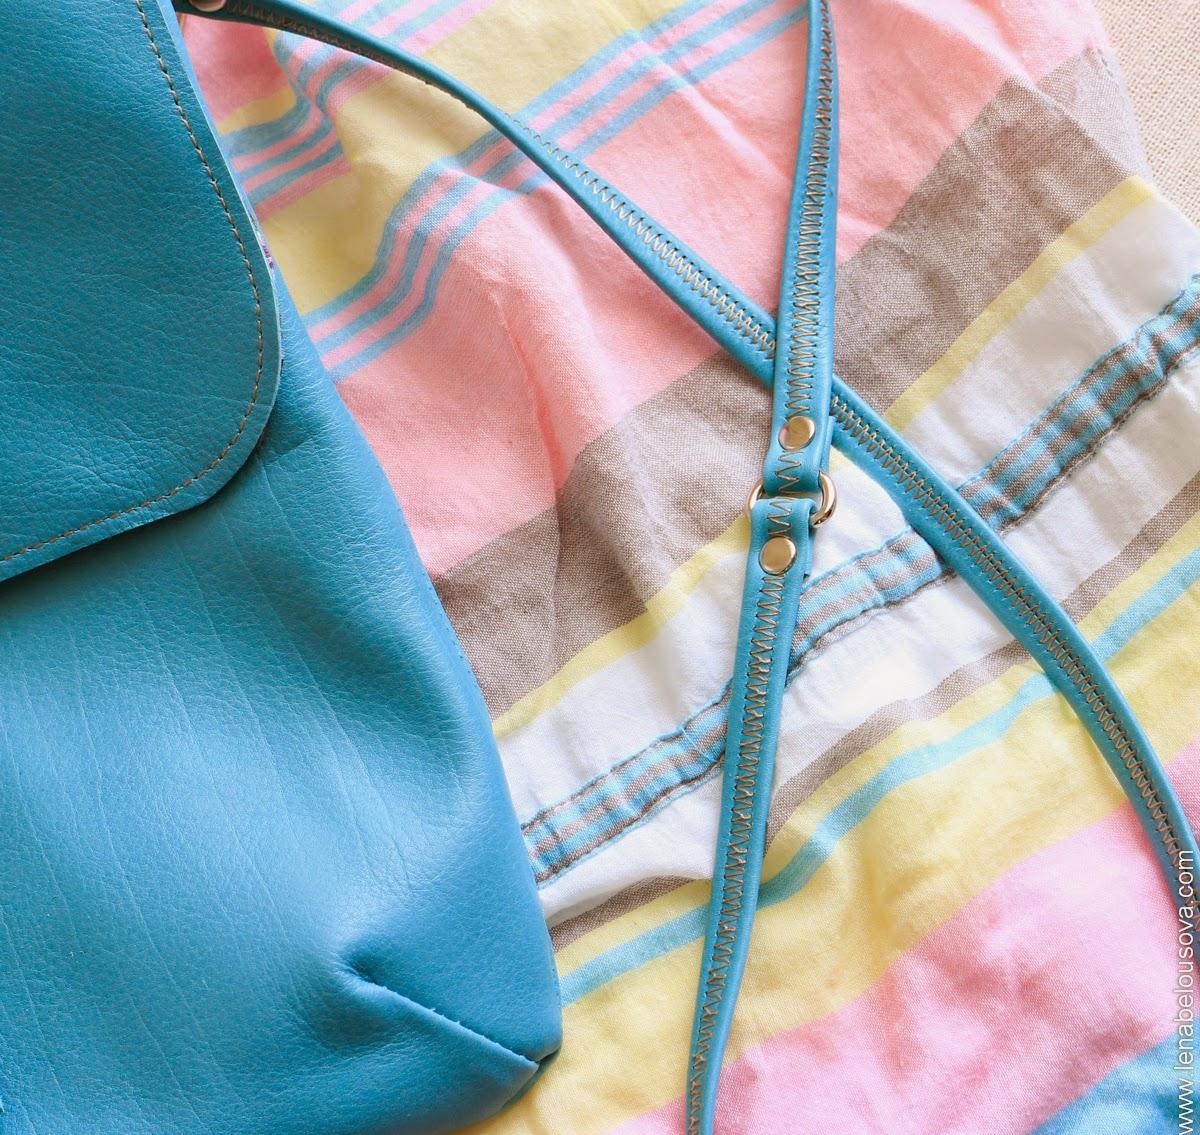 Цветная кожаная сумка